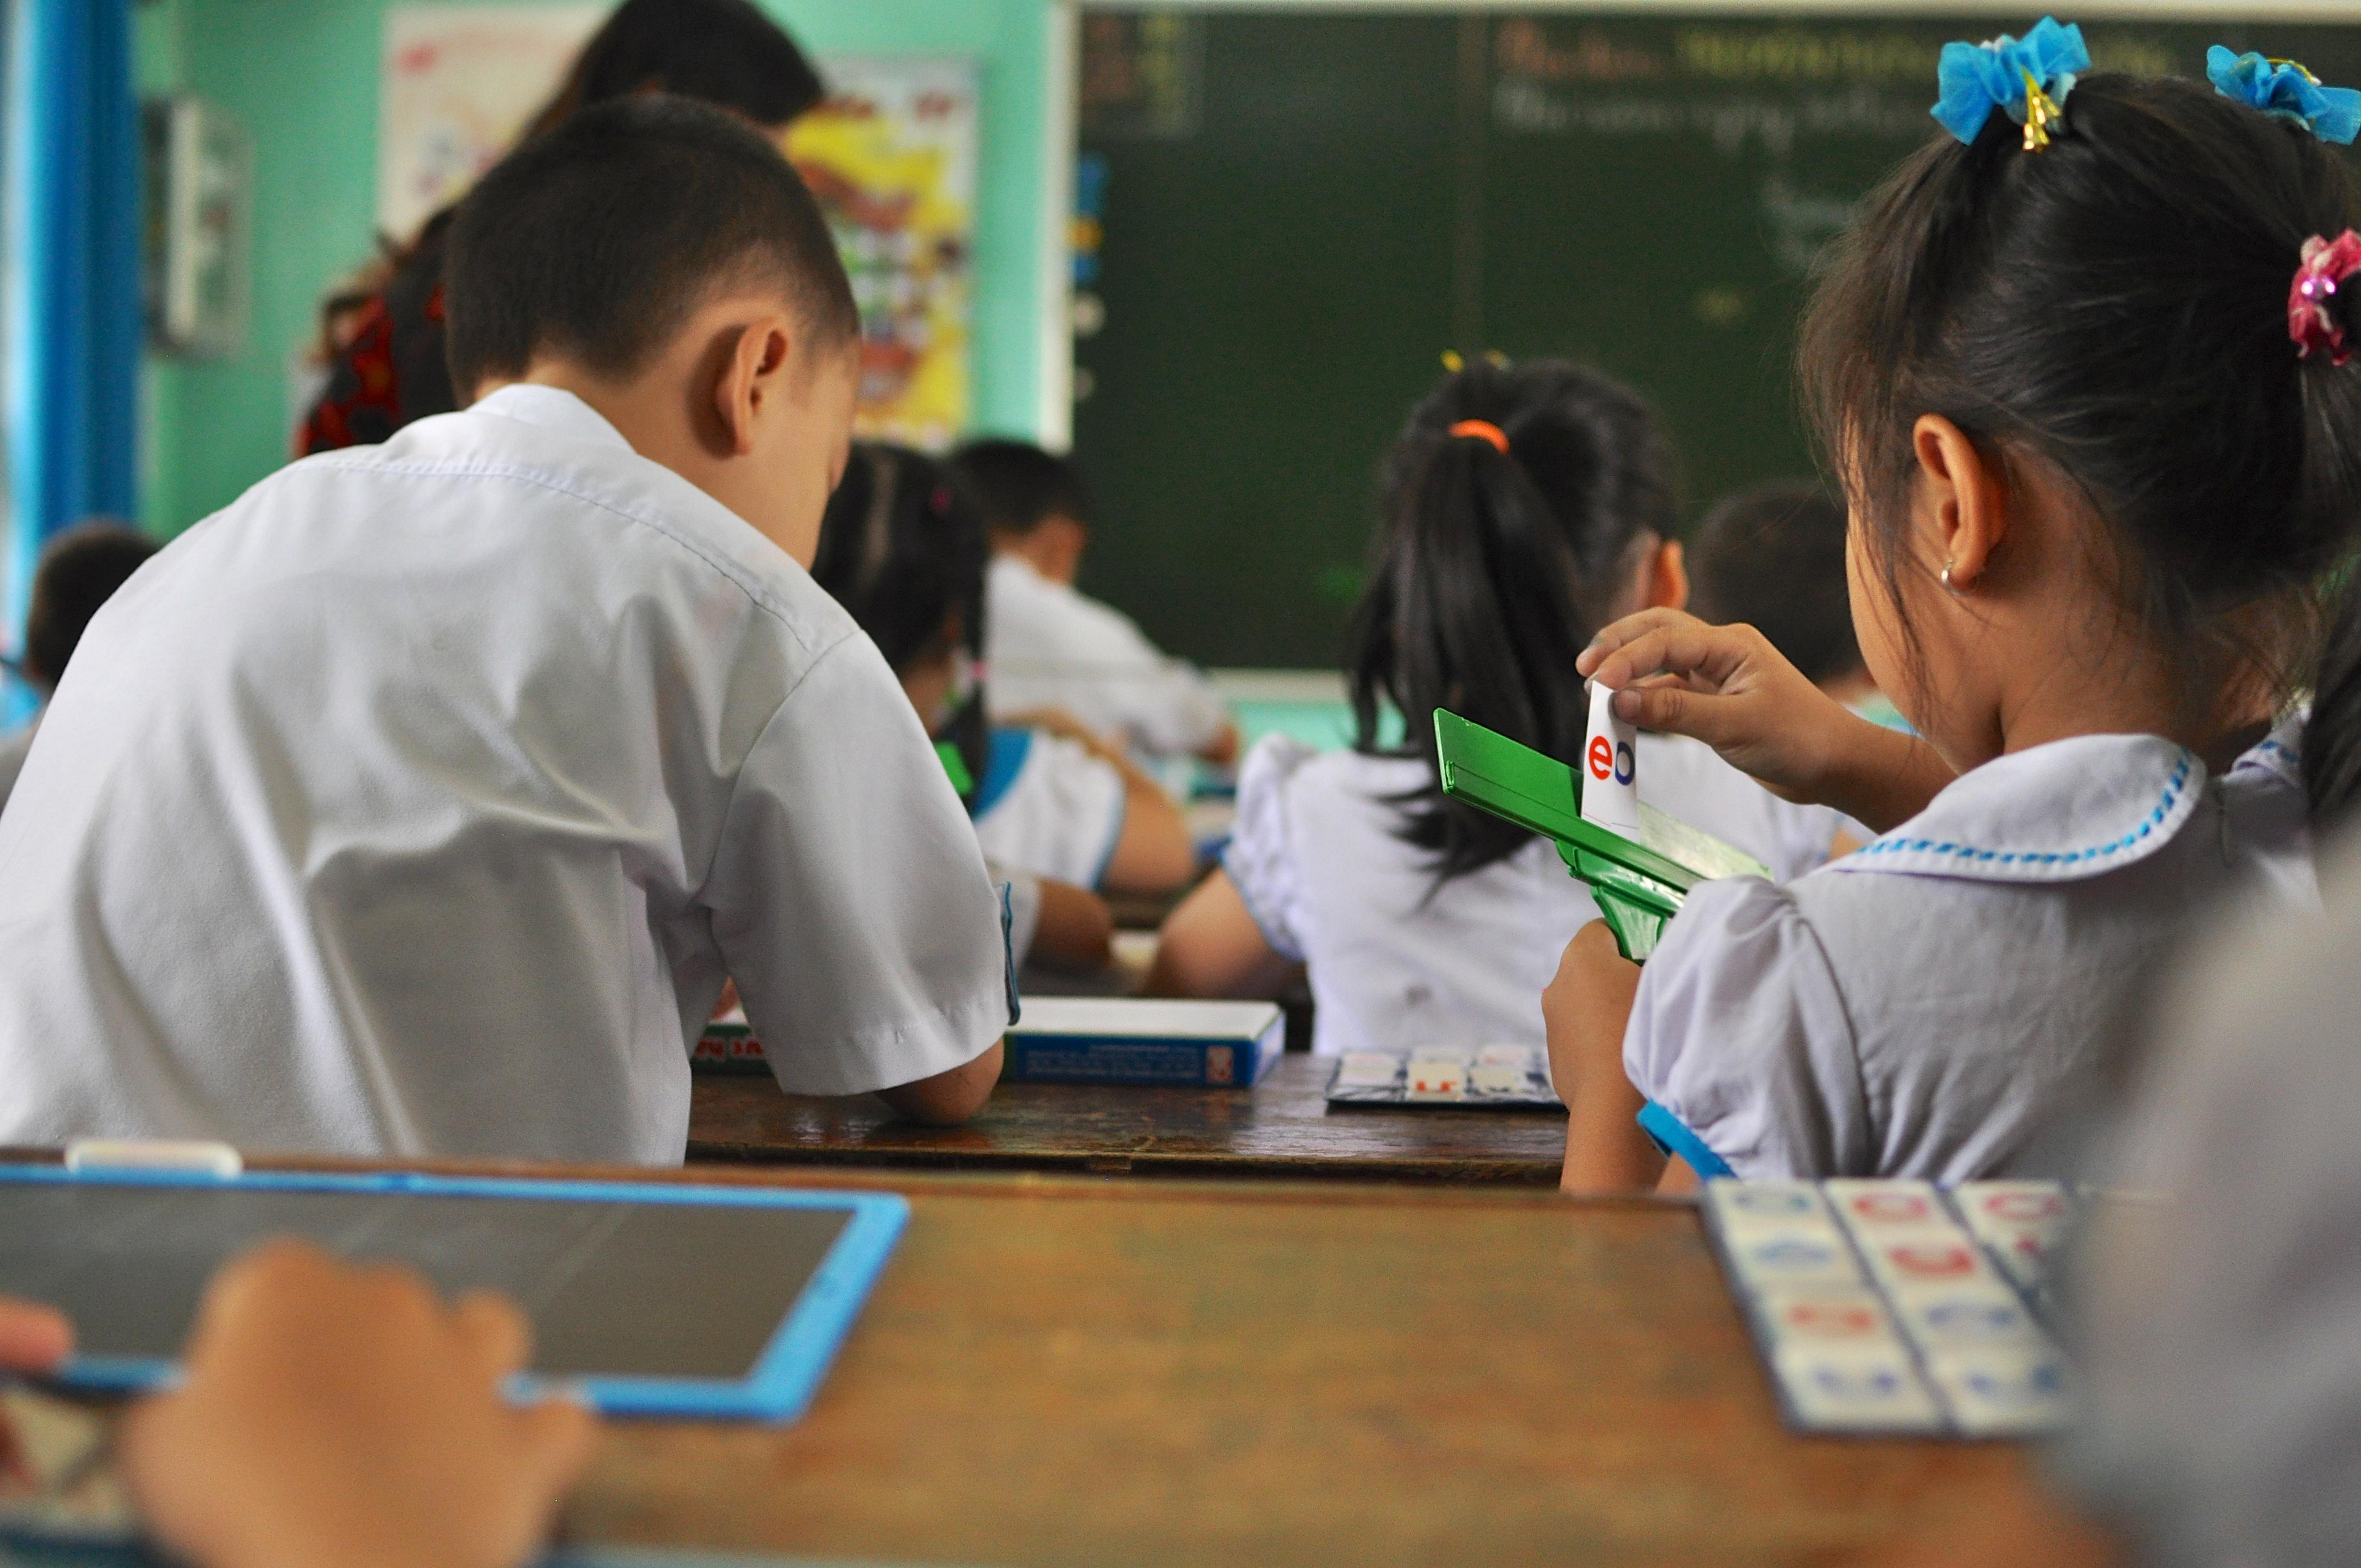 Children at primary school, grade 1